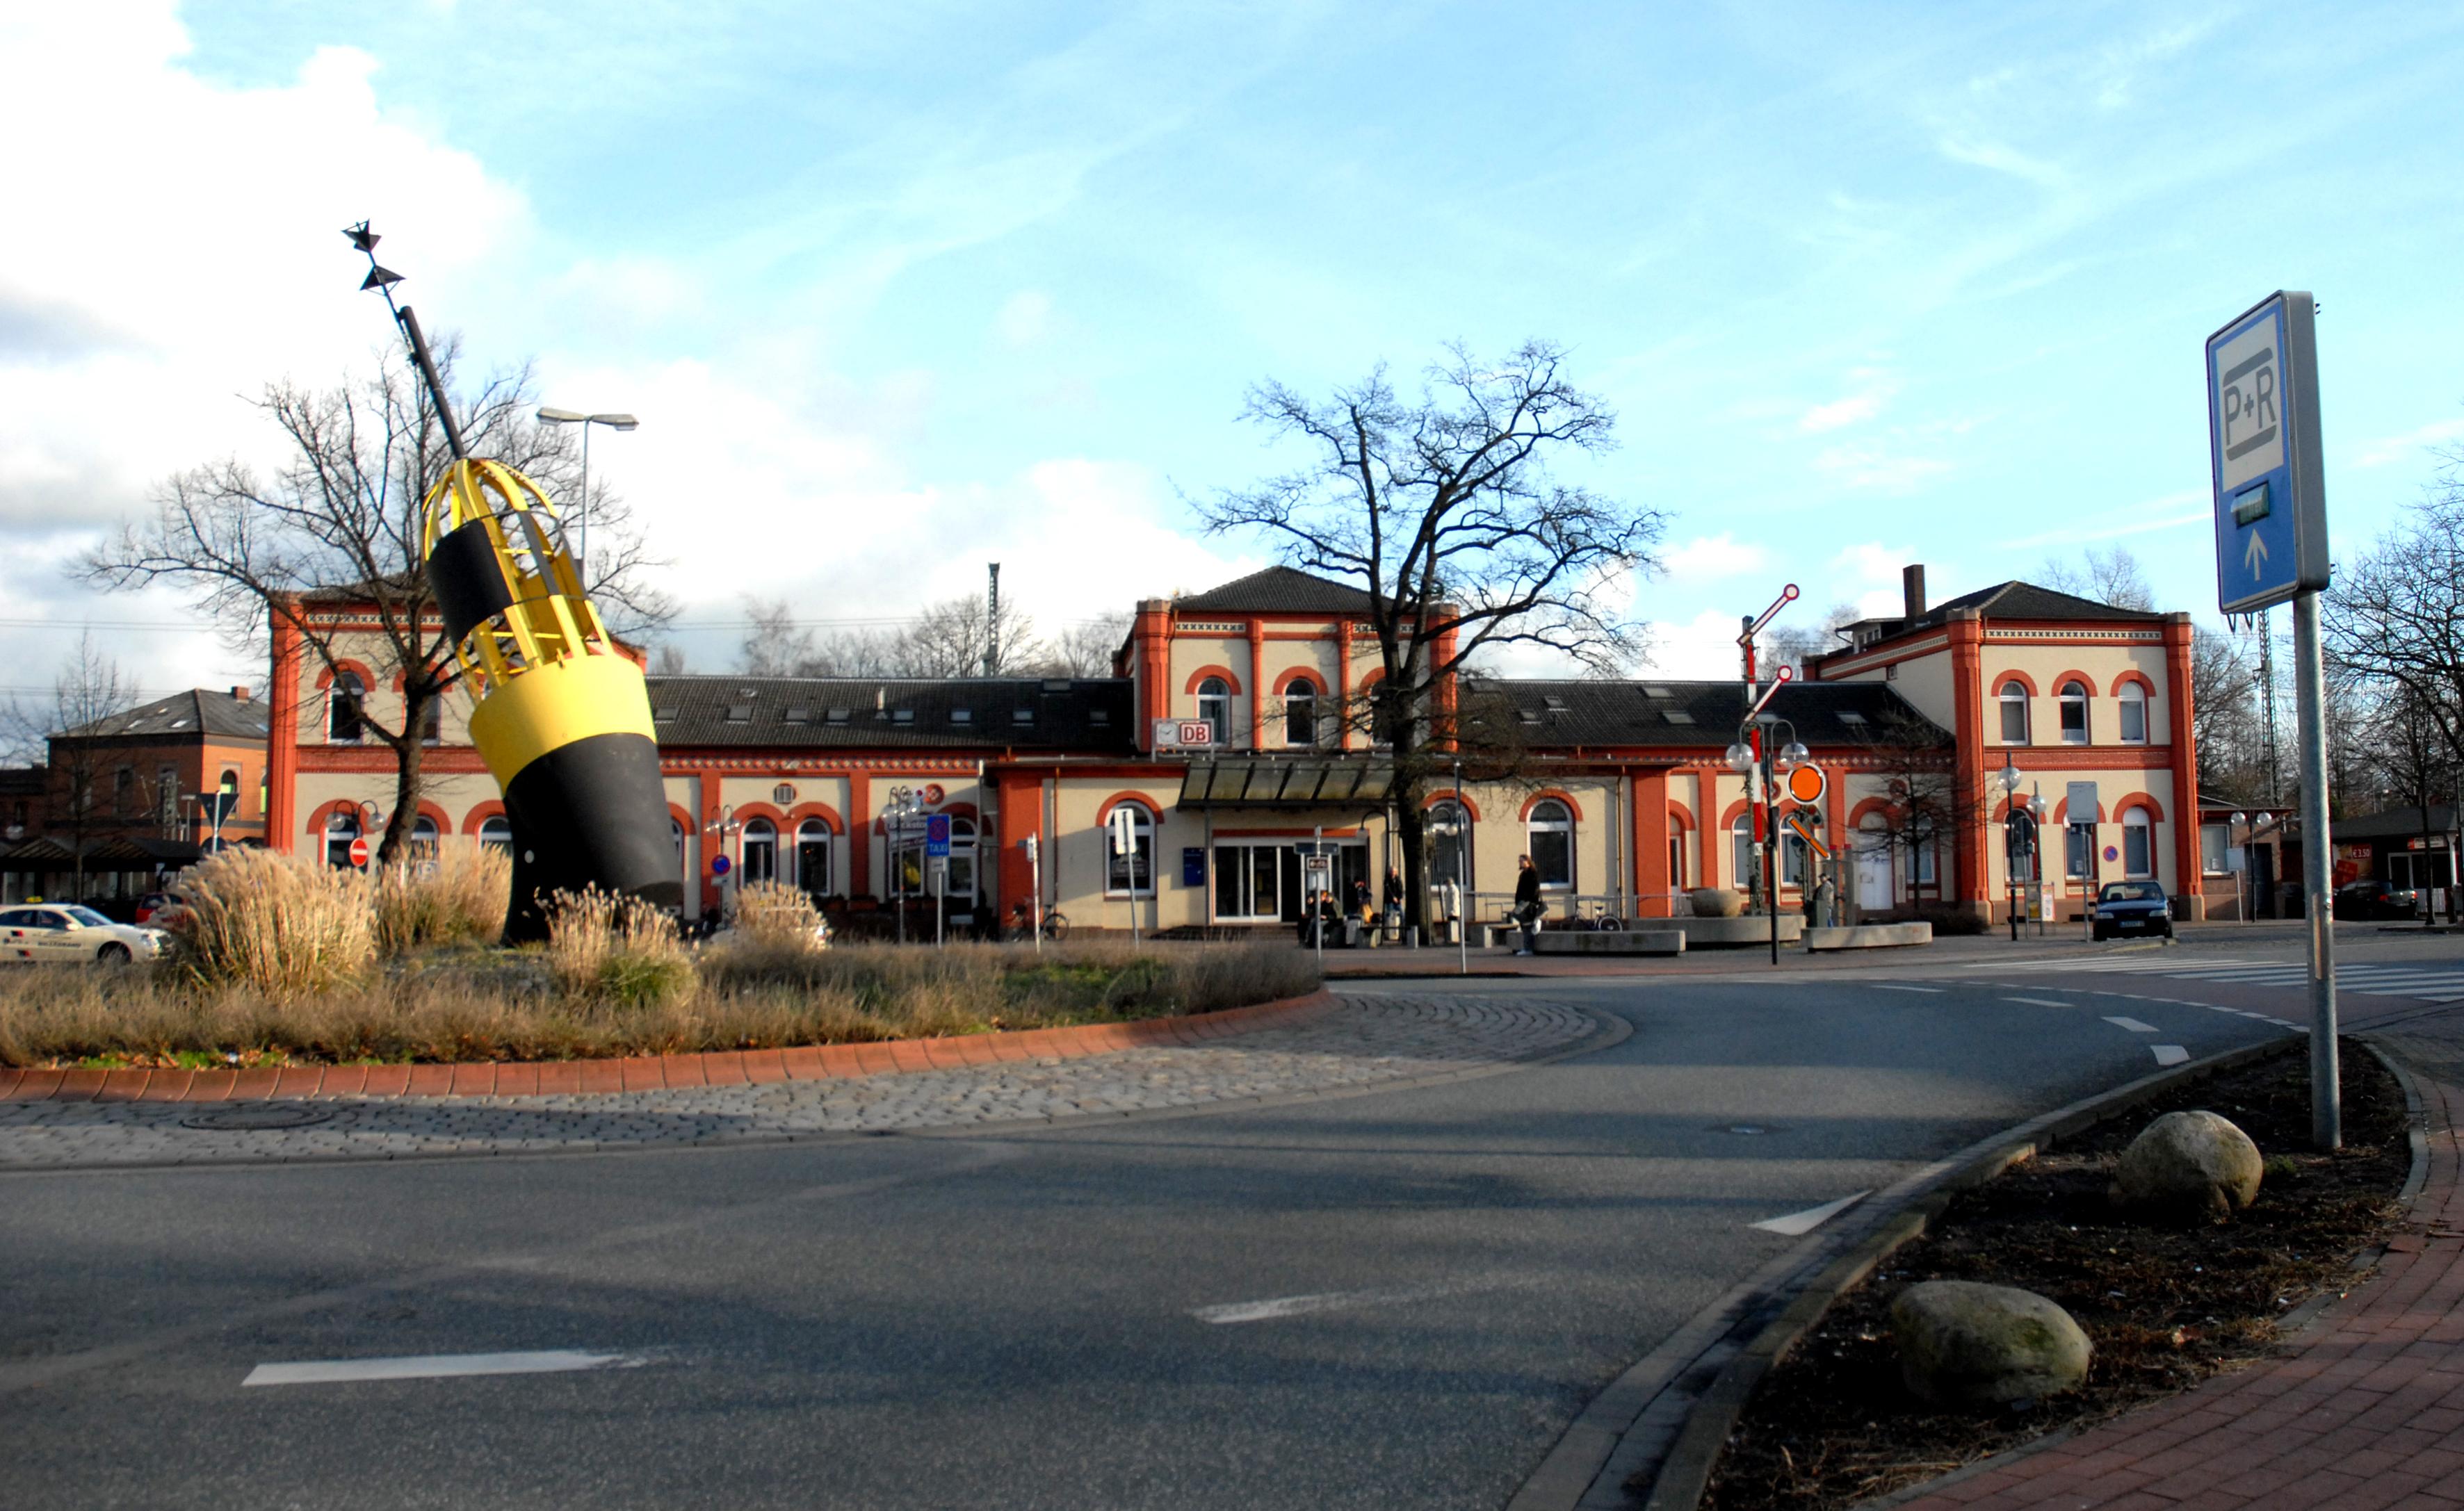 Augustfehn railway station